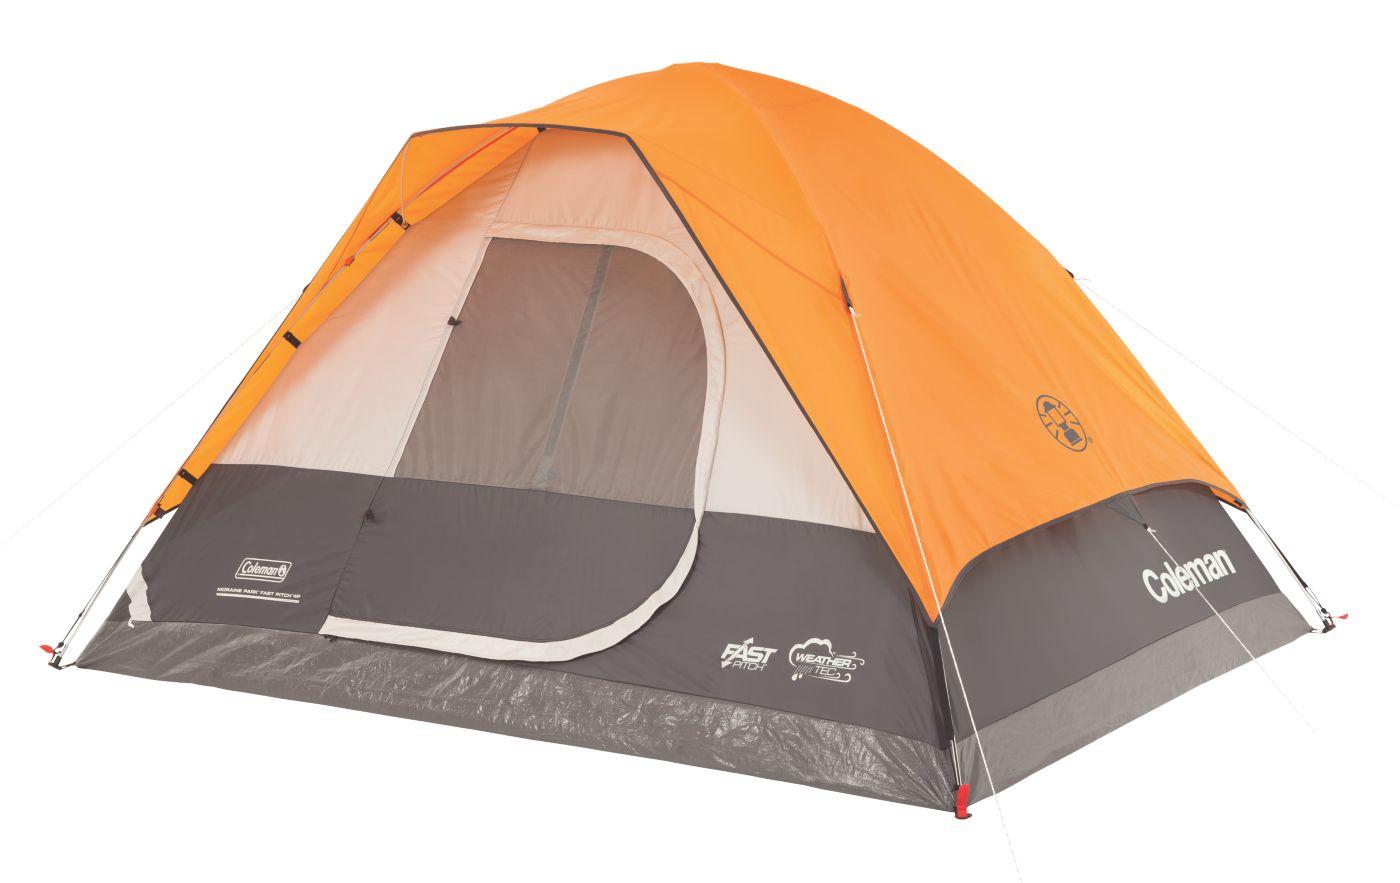 Moraine Park™ Fast Pitch™ 4-Person Dome Tent  sc 1 st  Coleman & Fast Pitch Tents | Camping Tents | Coleman